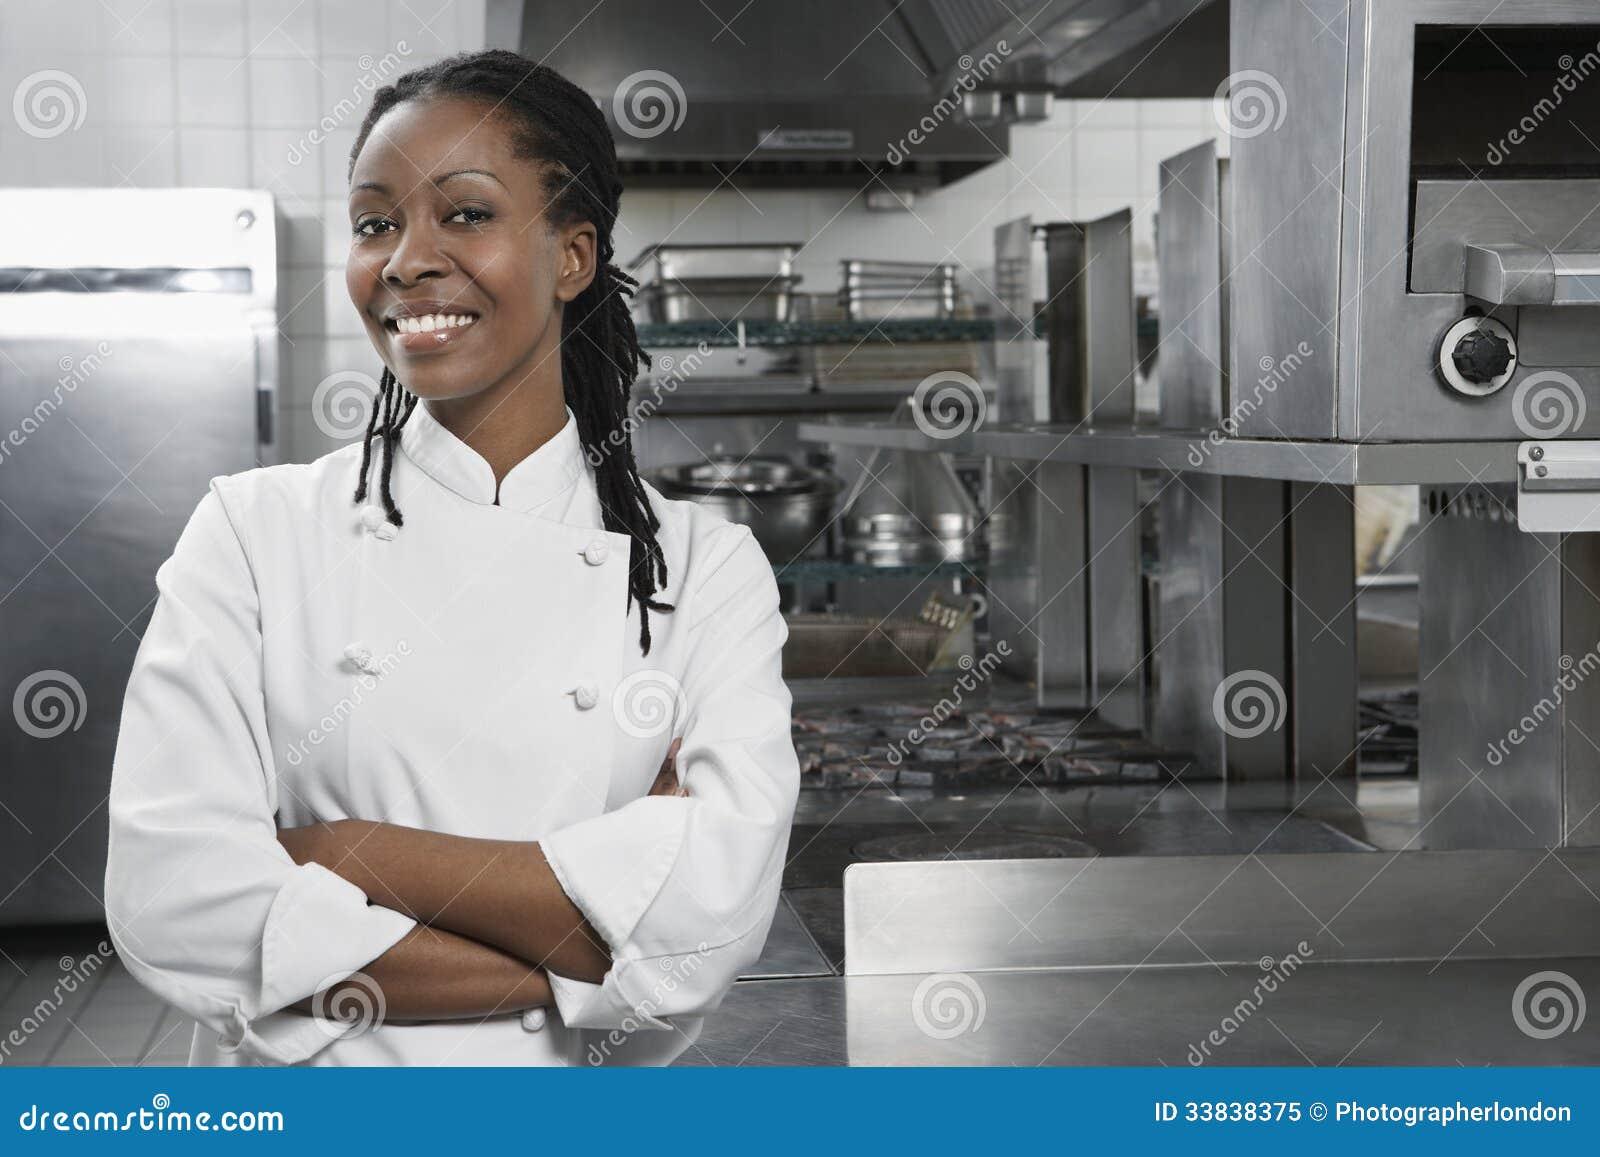 Cocinero de sexo femenino In The Kitchen